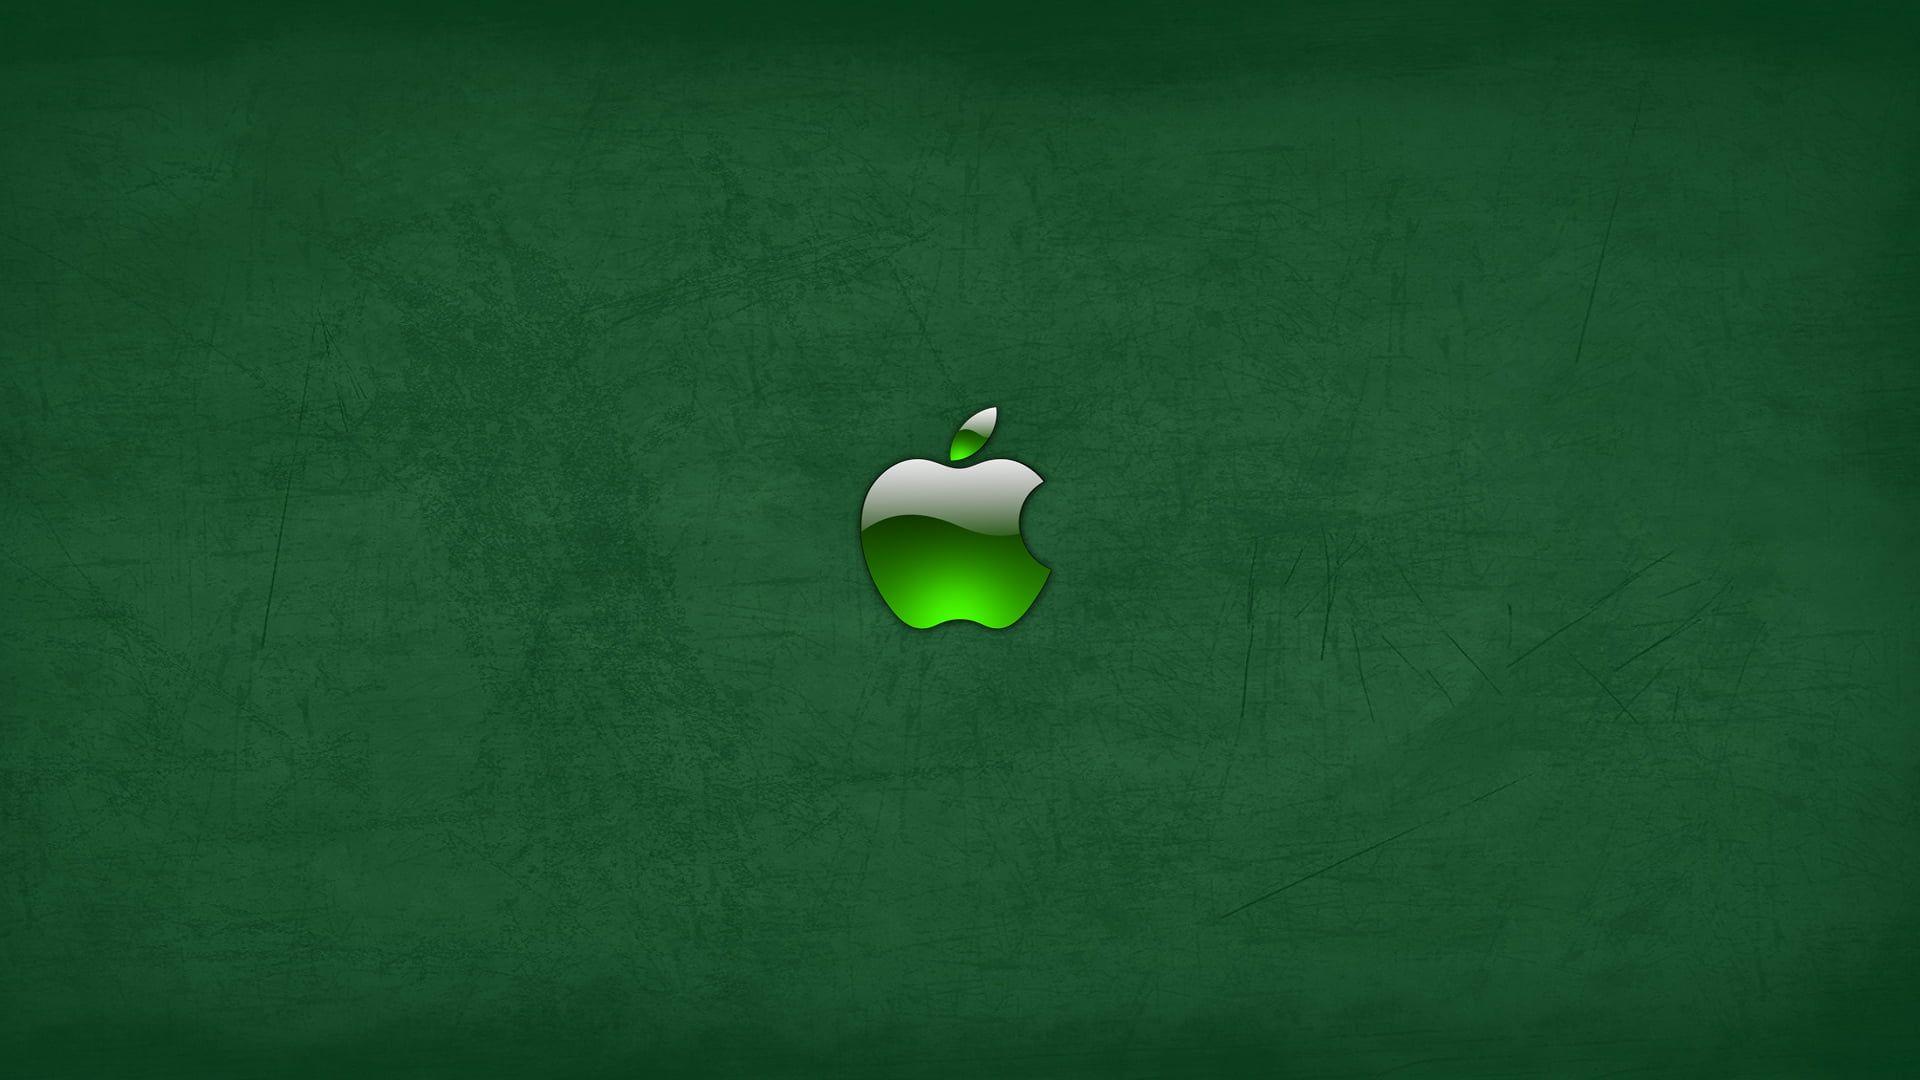 Apple Logo Green Apple Apple Mac 1080p Wallpaper Hdwallpaper Desktop In 2021 Apple Picture Apple Logo Wallpaper Apple Logo Apple logo apple wallpaper hd 1080p